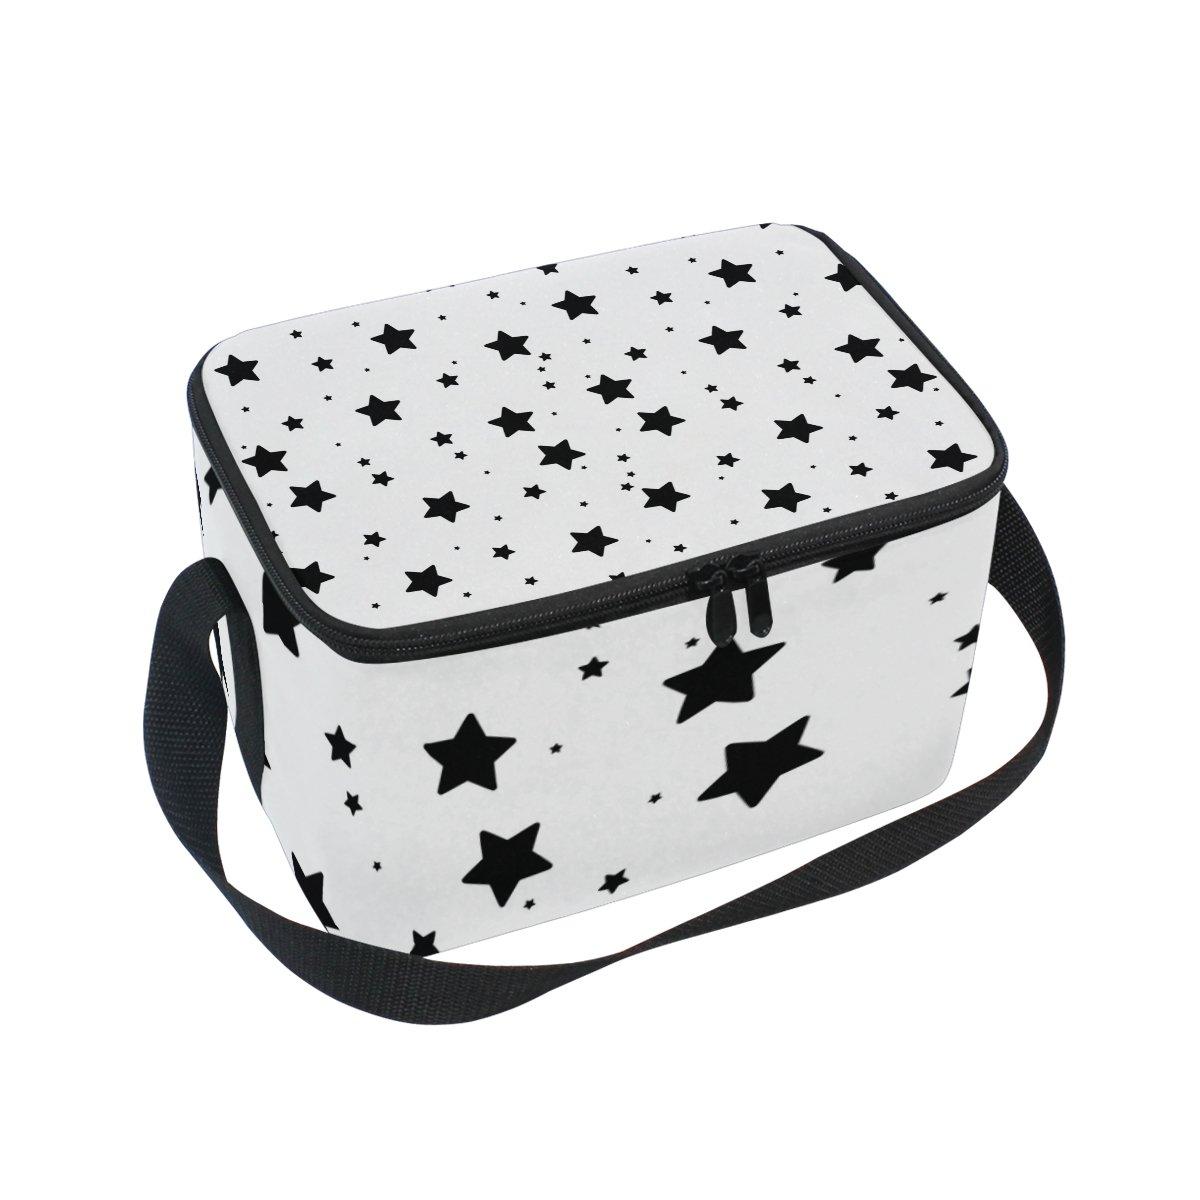 ALIREA Twinkle Stars Pattern Insulated Lunch Box Bag Cooler Reusable Tote Bag with Adjustable Shoulder Strap for Women Men